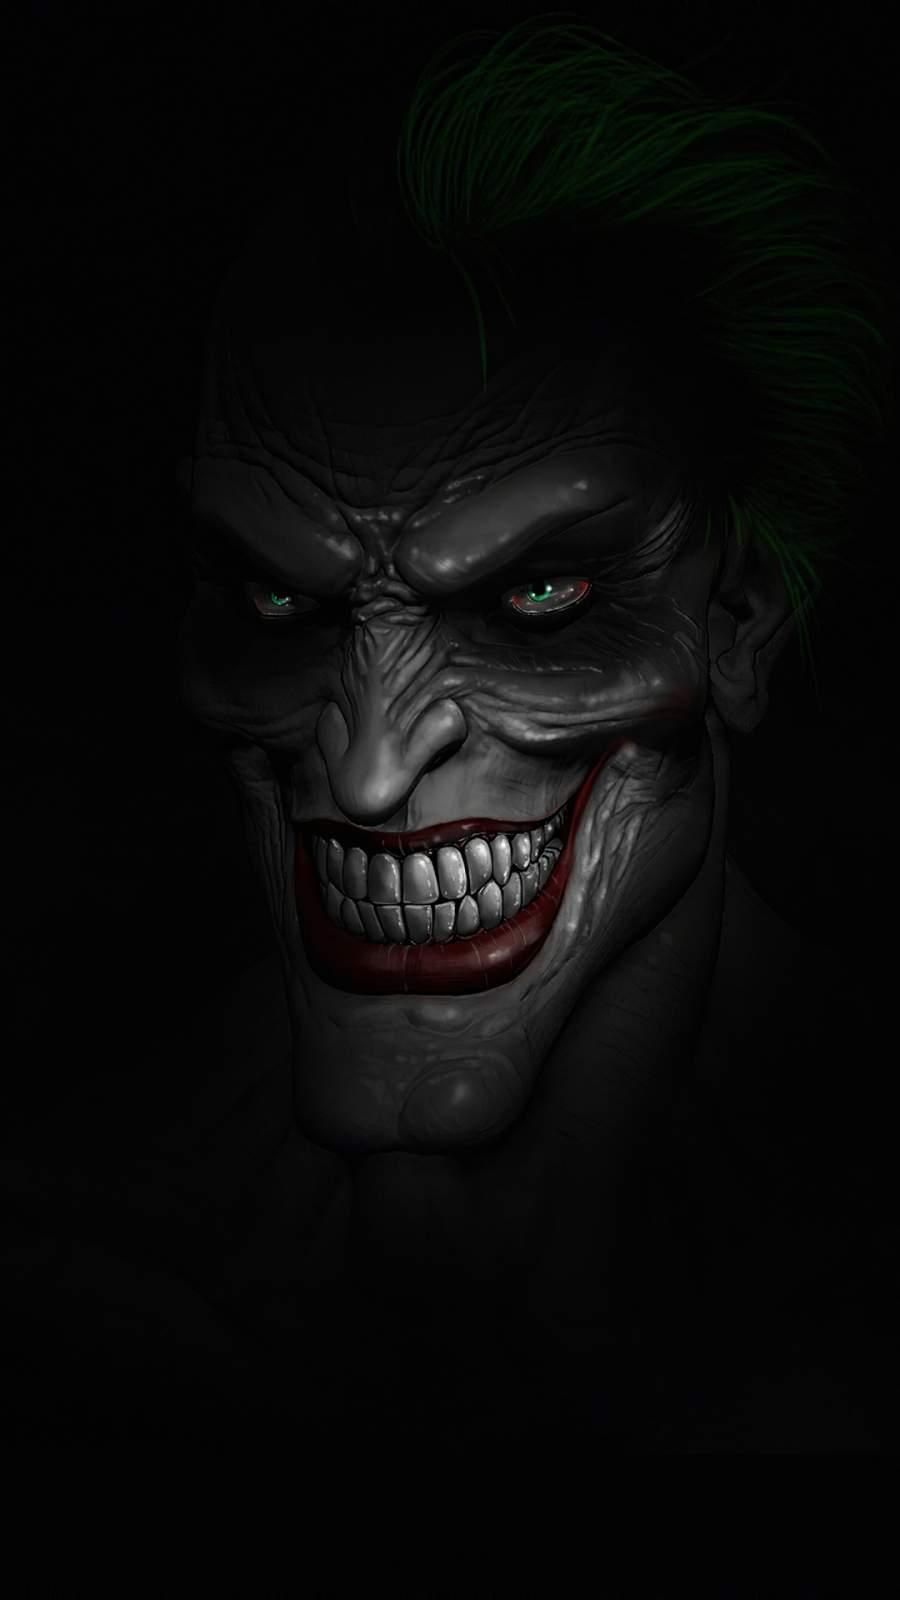 Joker Dark Minimalism iPhone Wallpaper